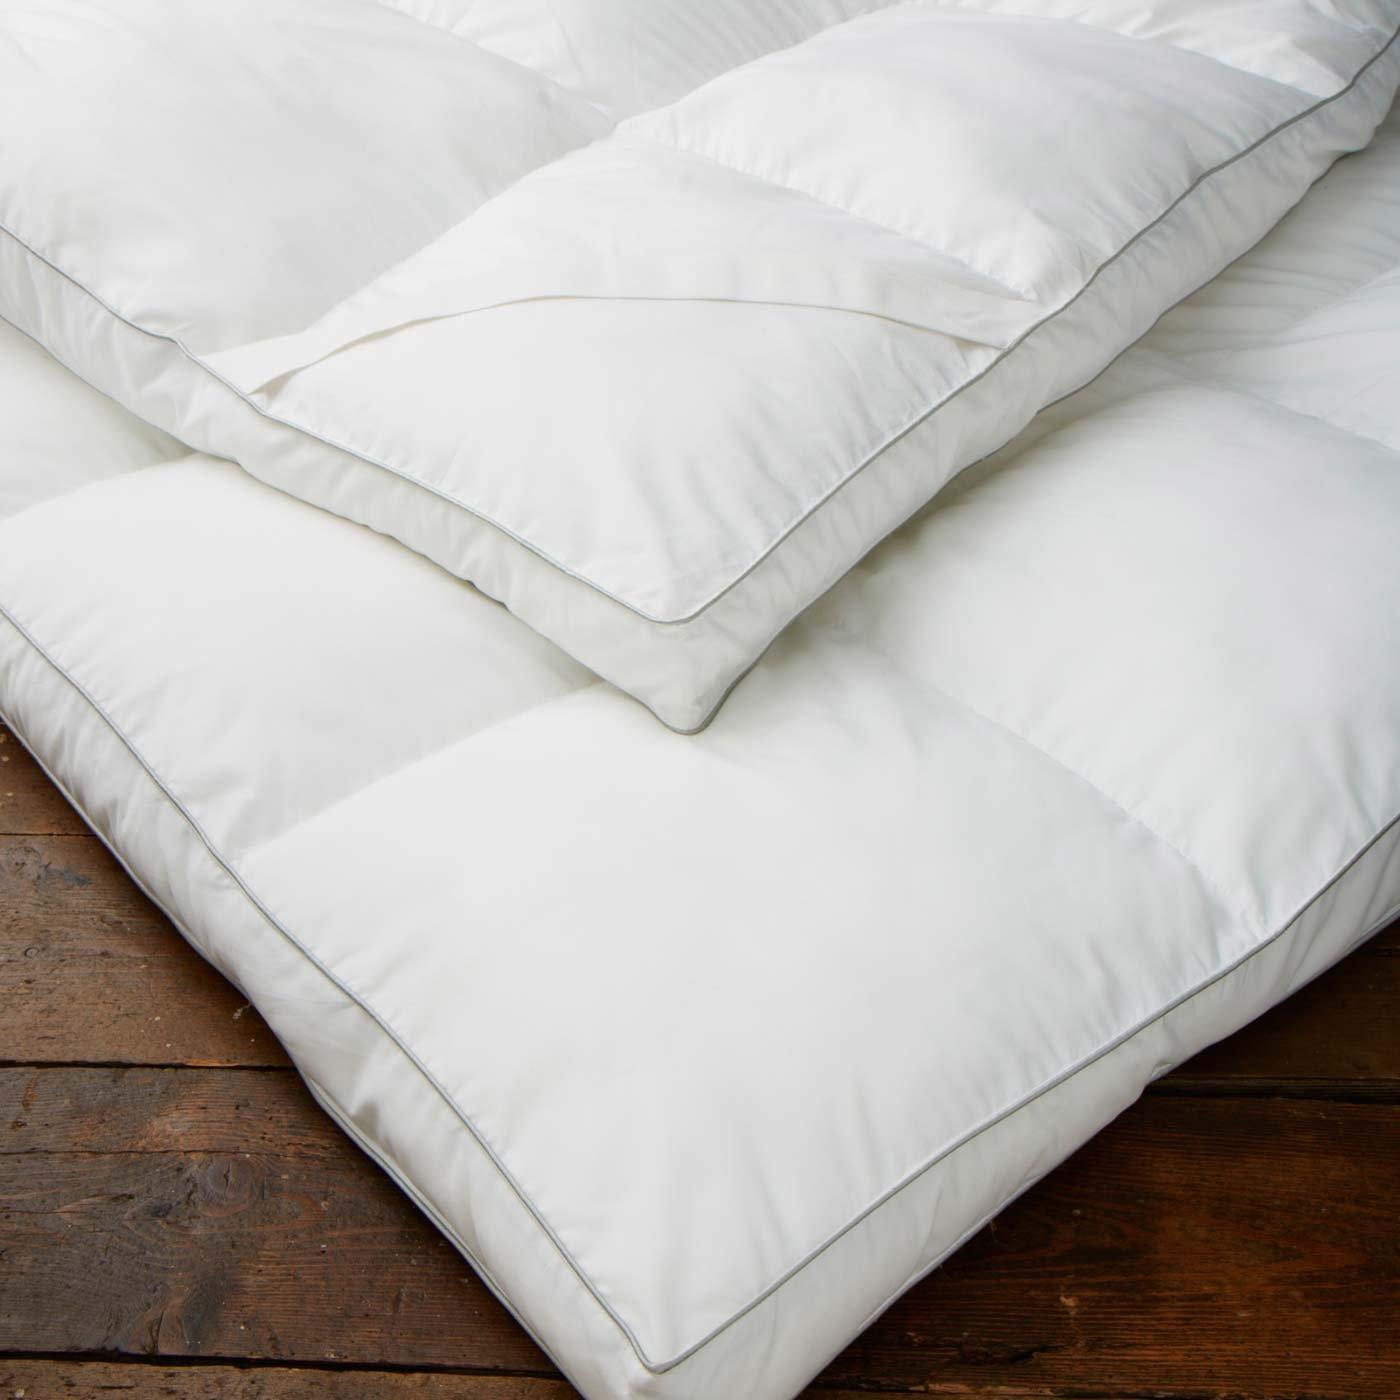 luxury soft as down microfibre mattress topper soaksleep